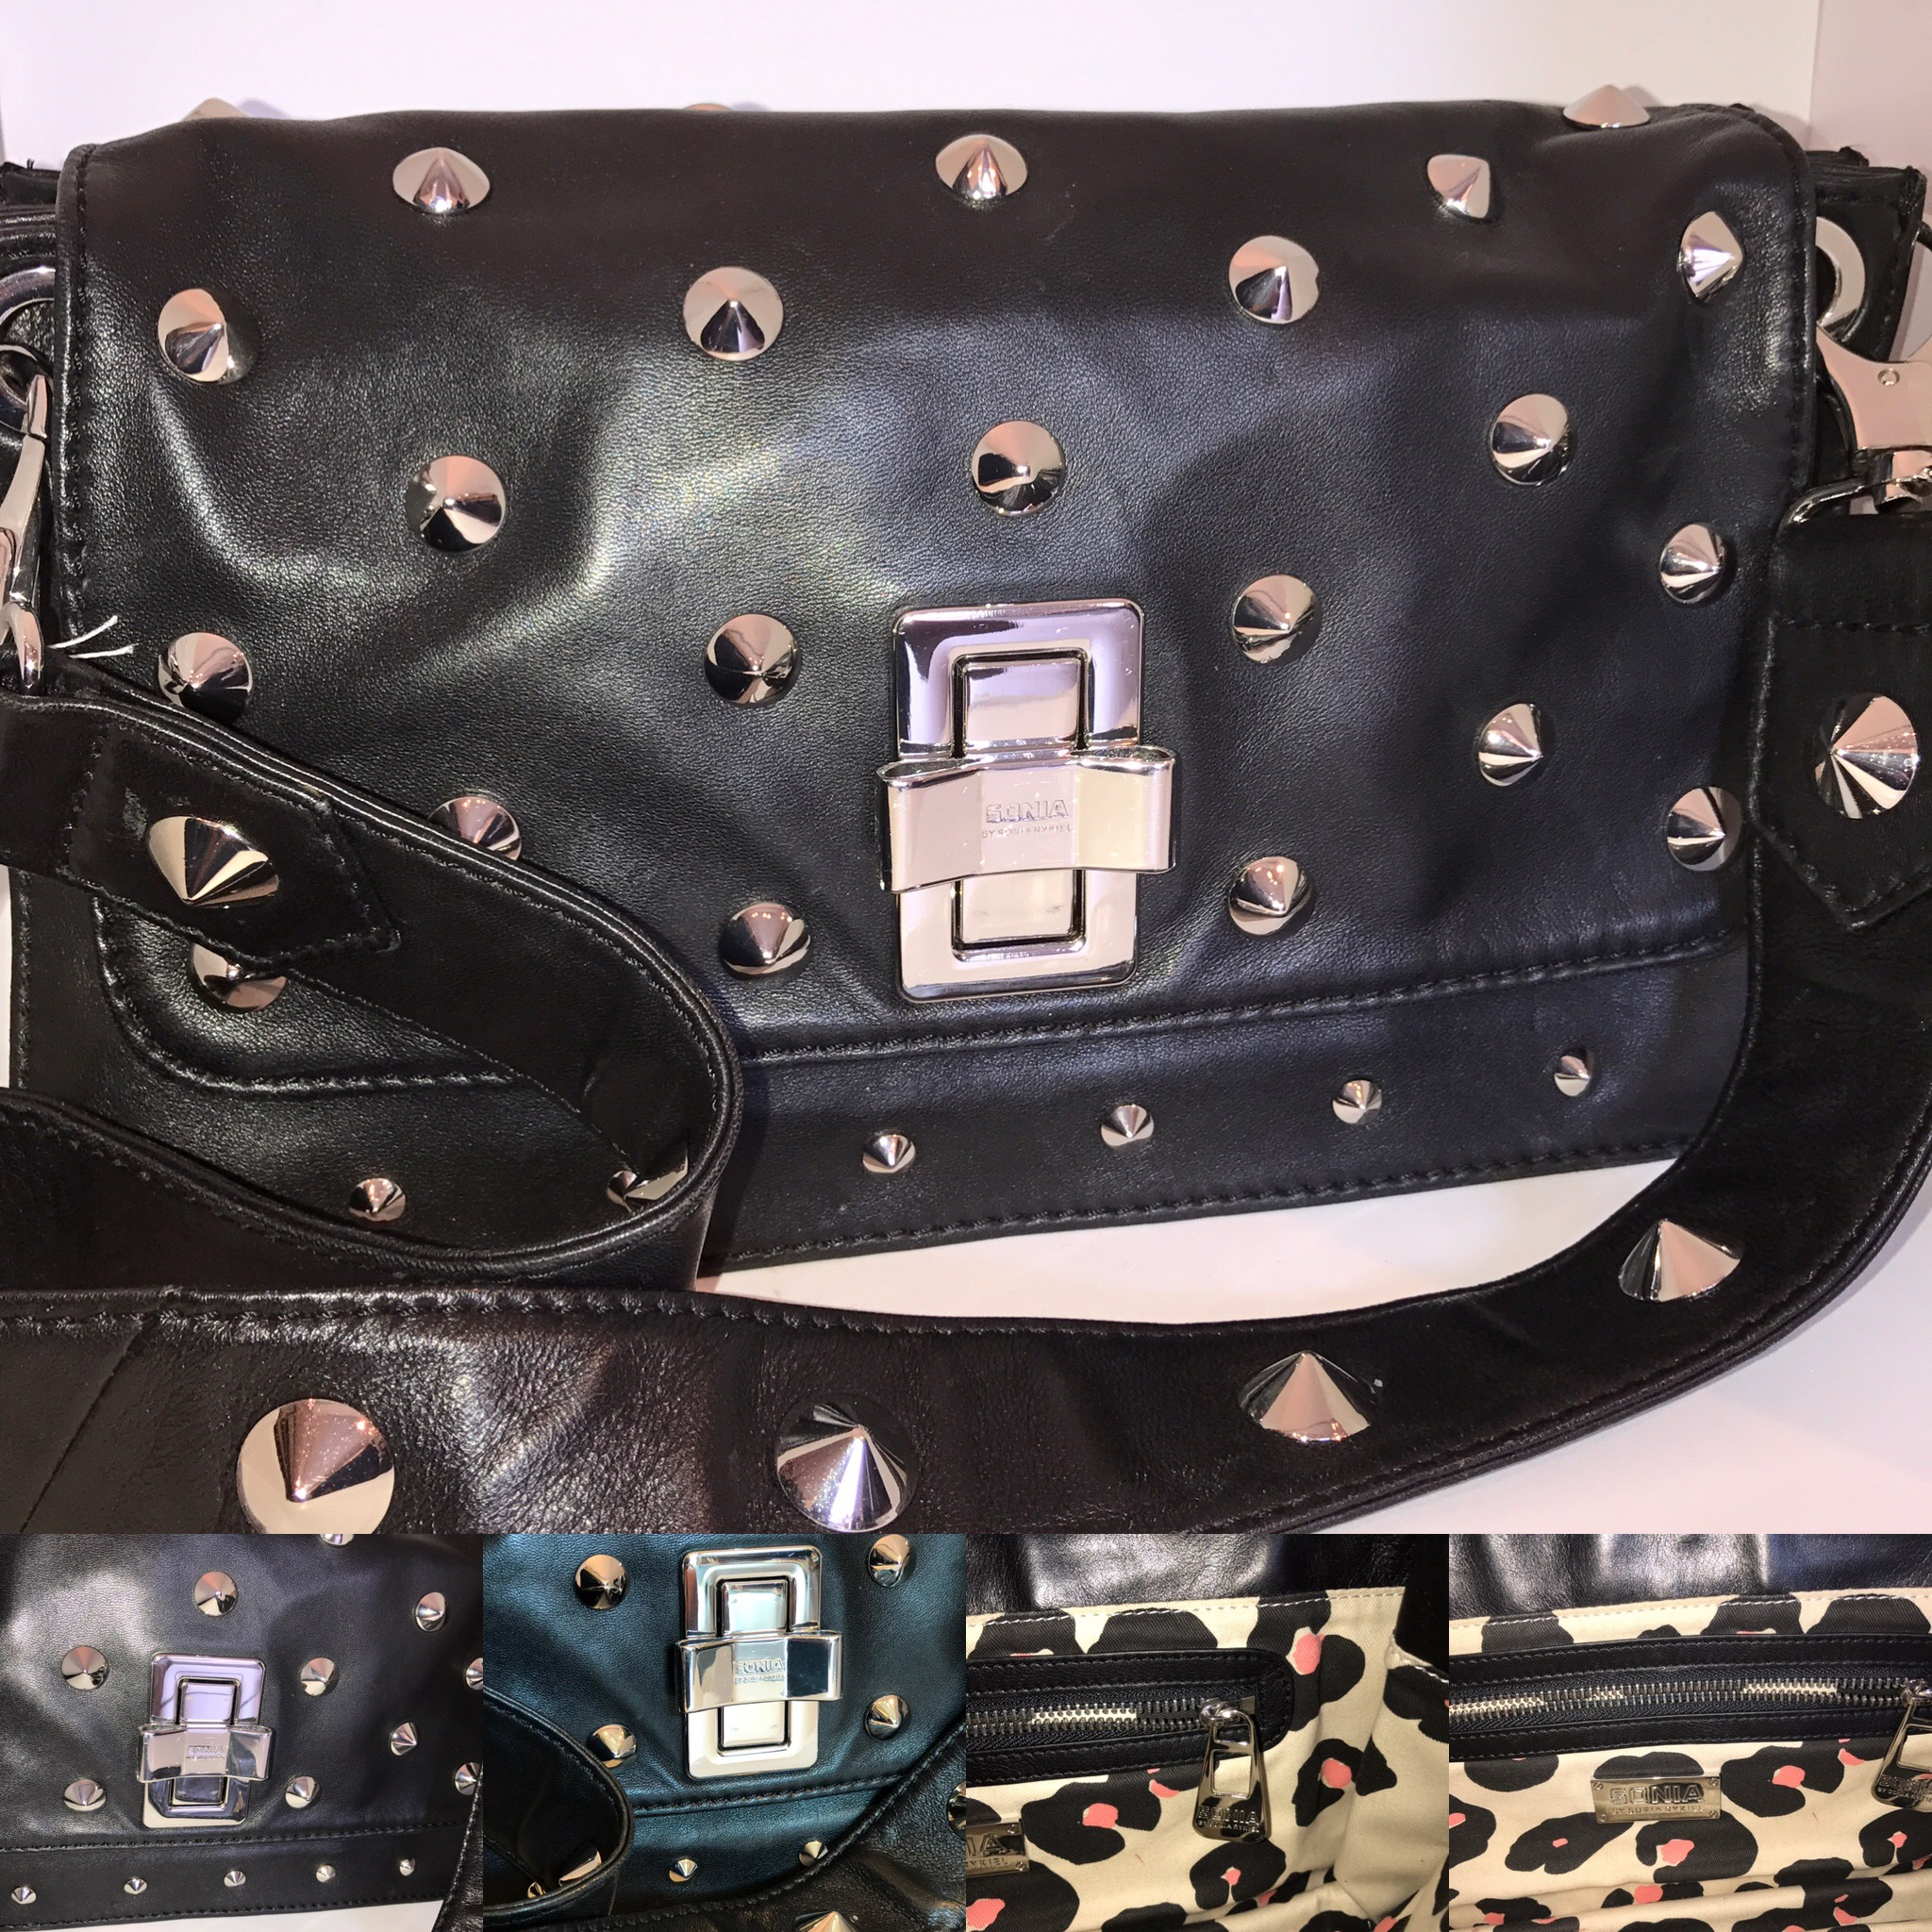 Sonia Rykiel black leather studded bag £199.JPG